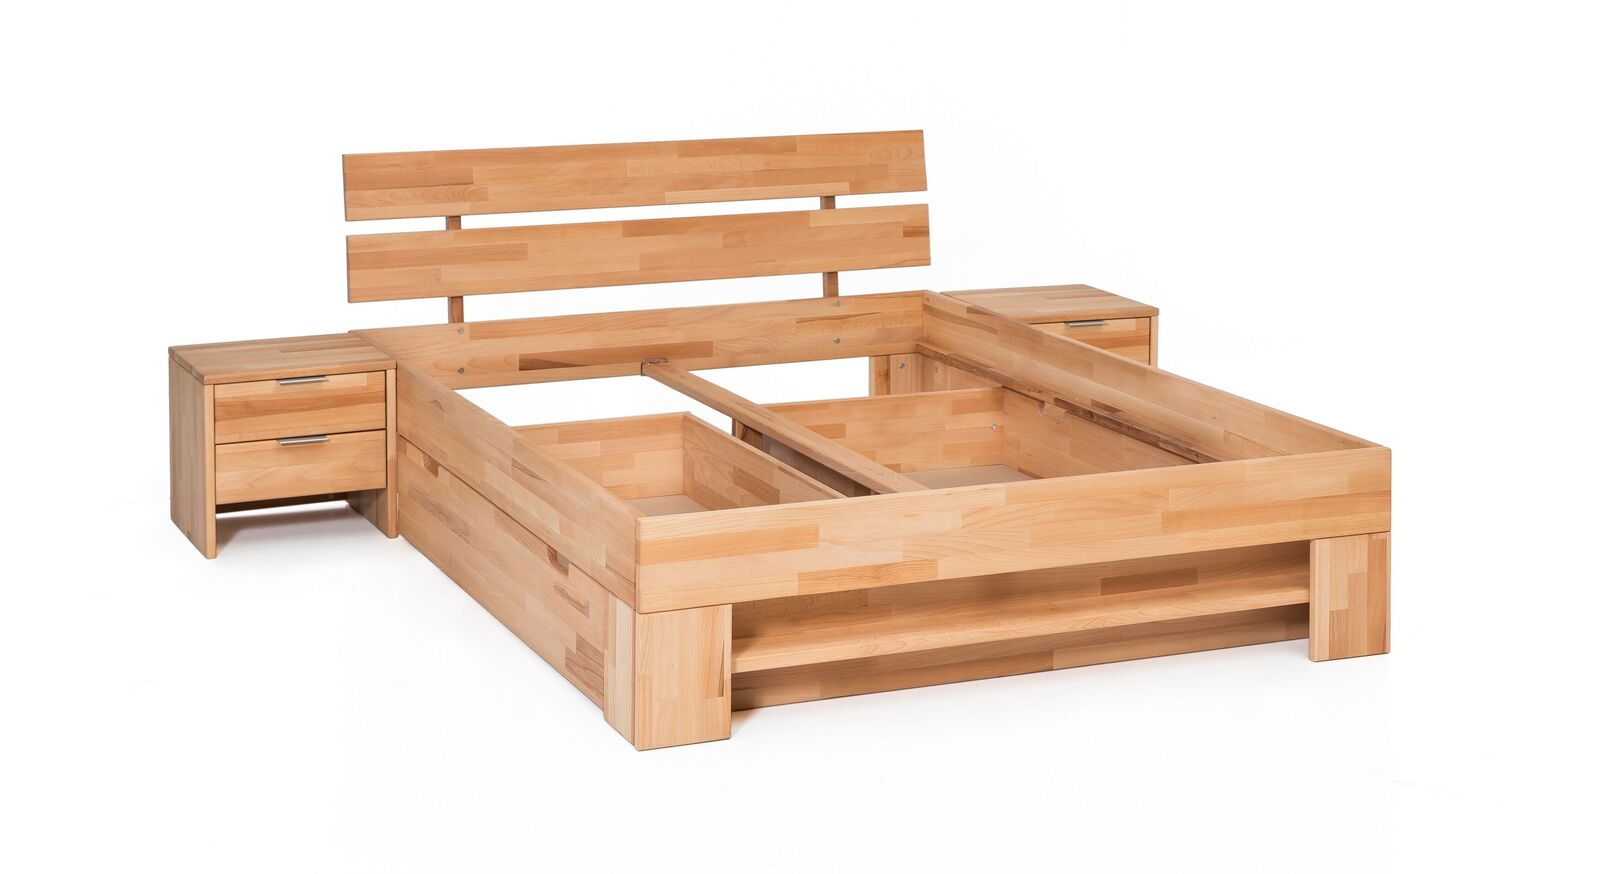 Stabiles und robustes Schubkasten-Bett Valisia